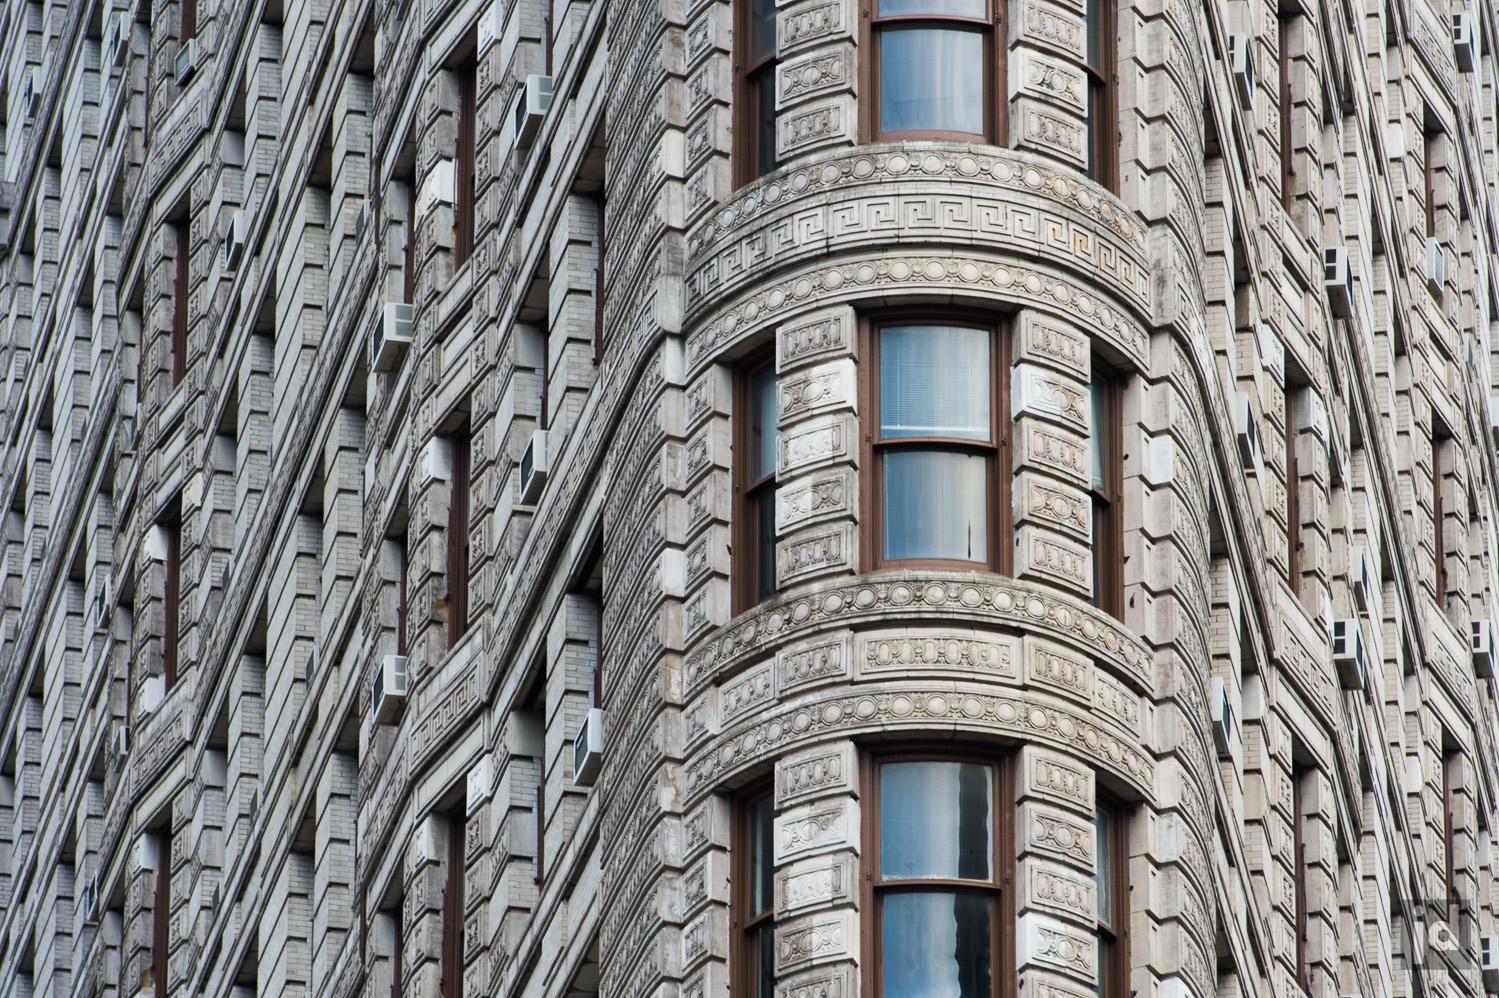 NewYork_USA_Photography_Jason_Davis_Images_014.jpg